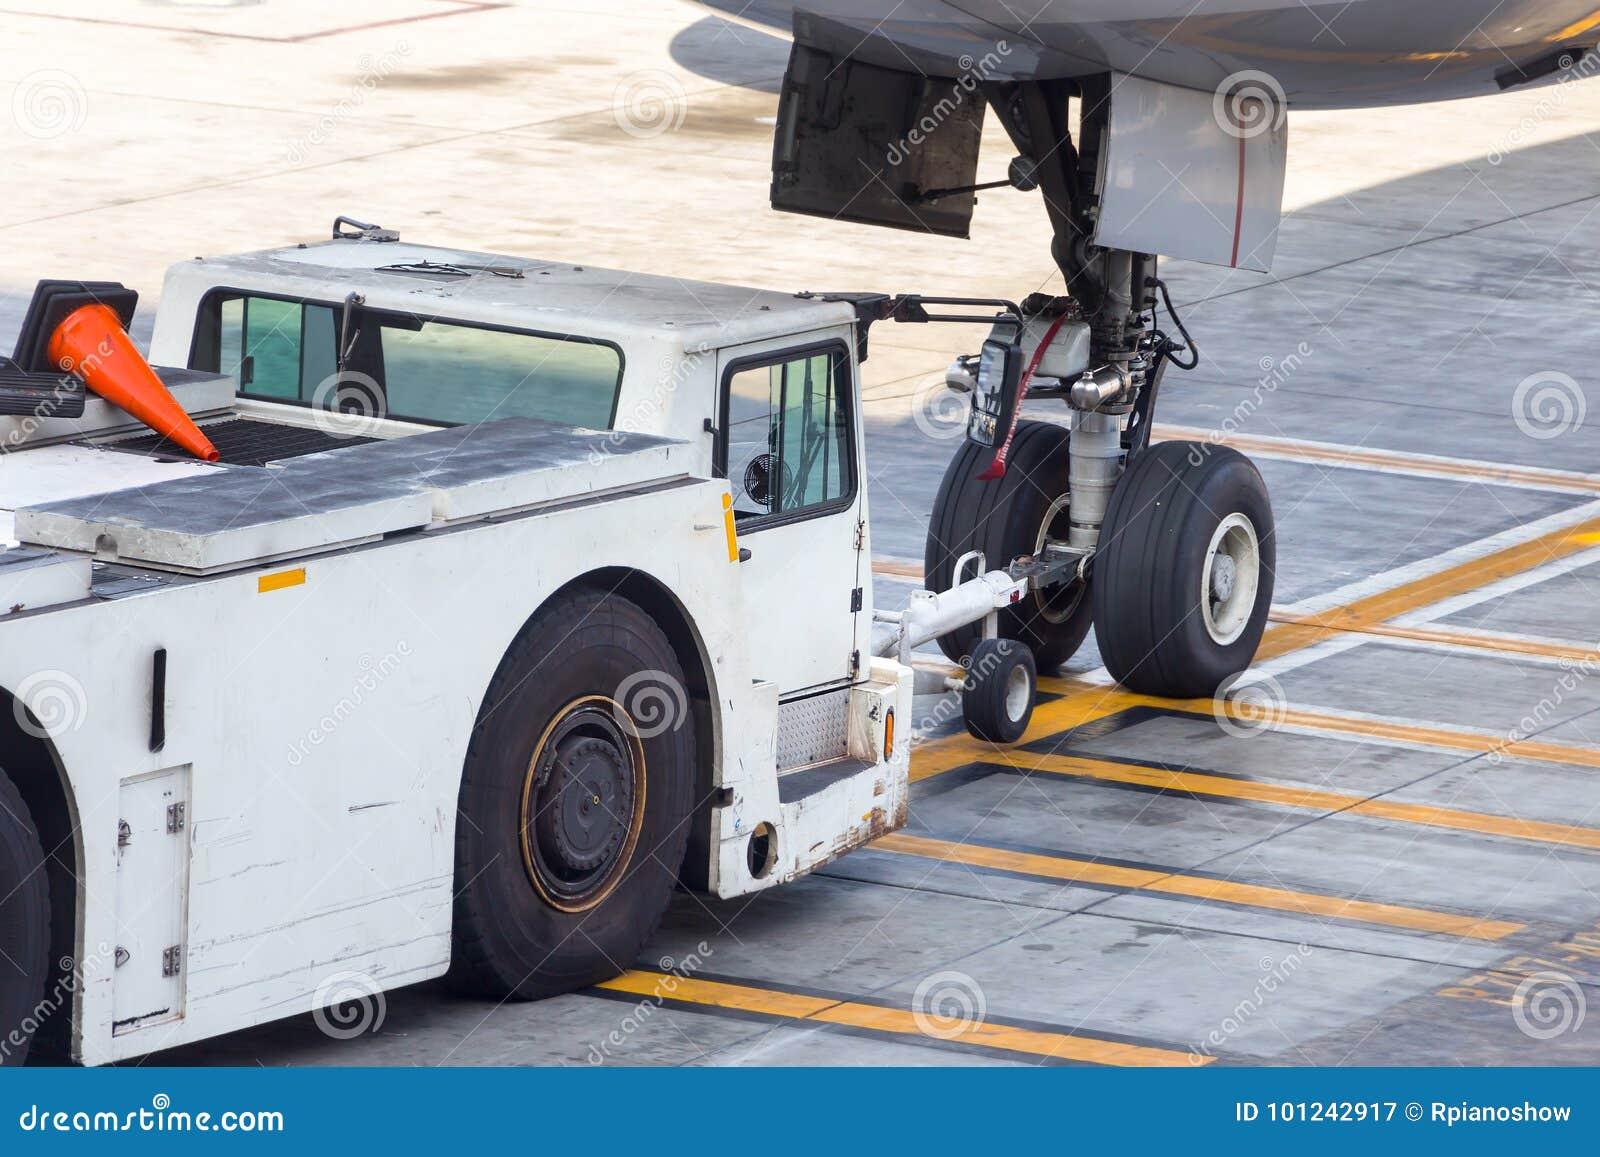 Hook up on plane